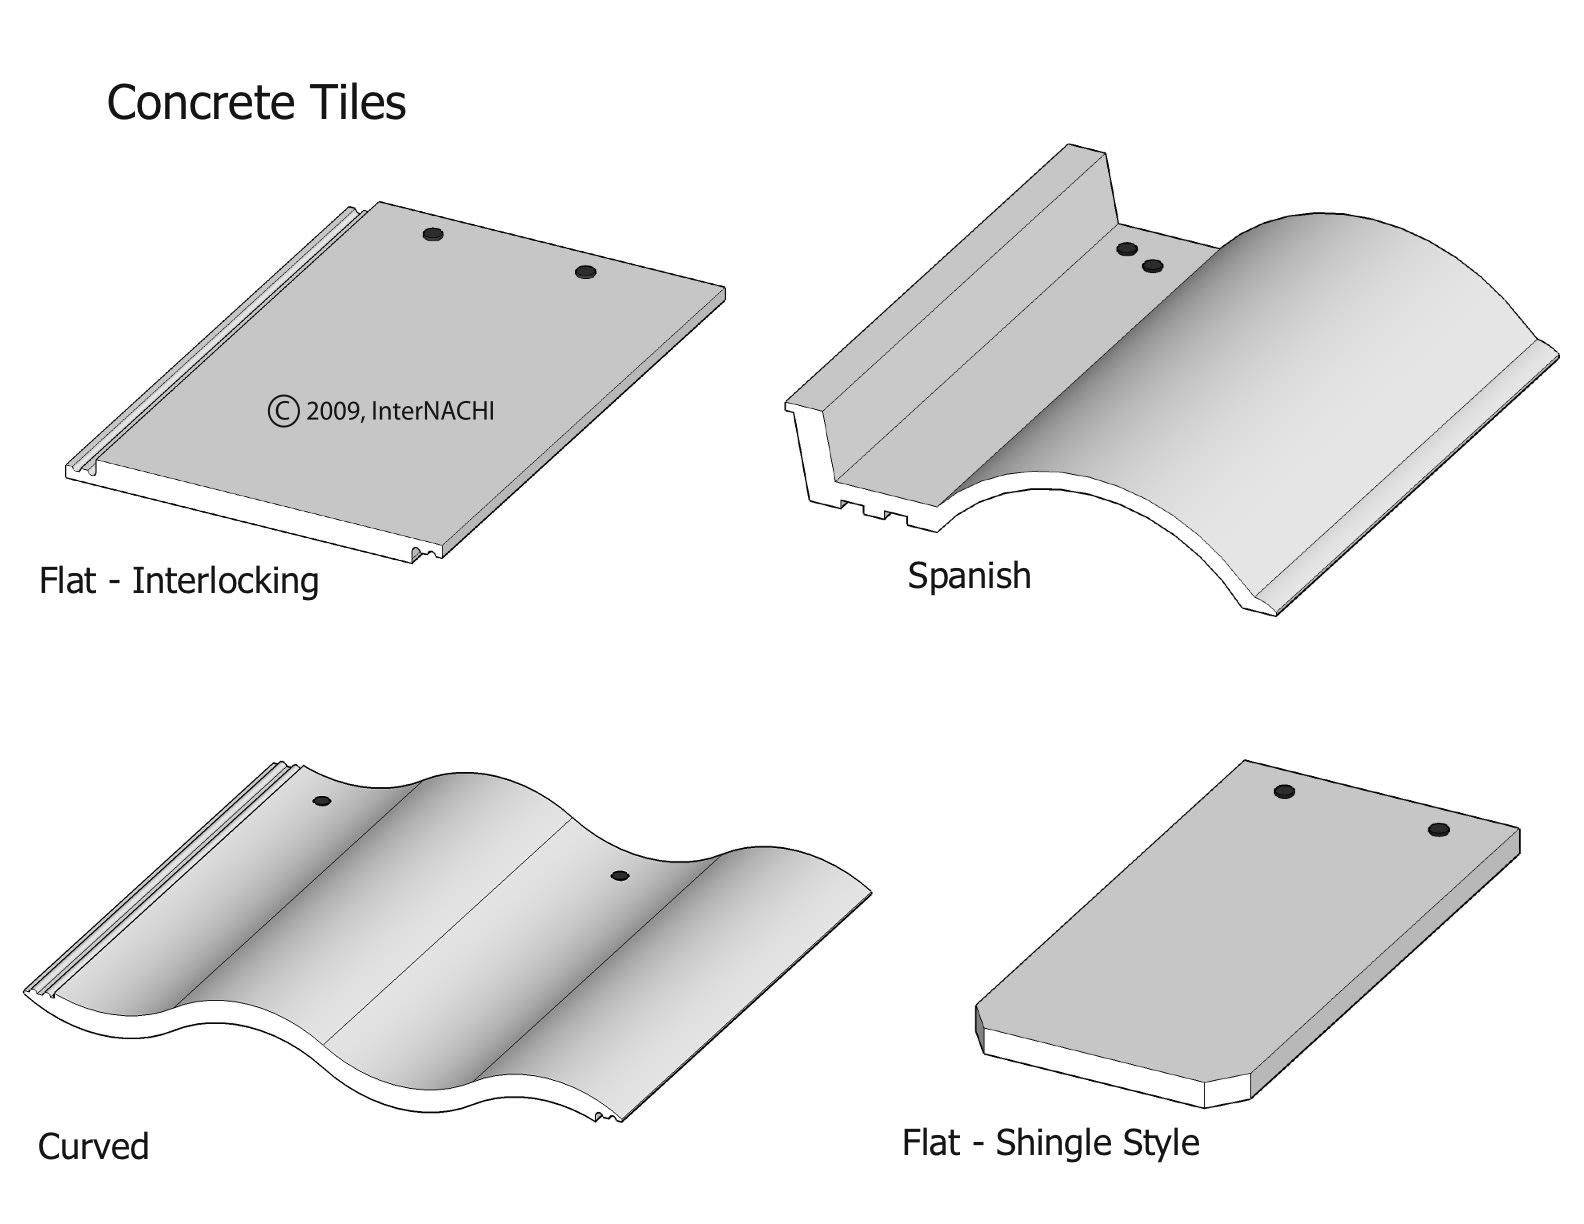 Concrete tiles.